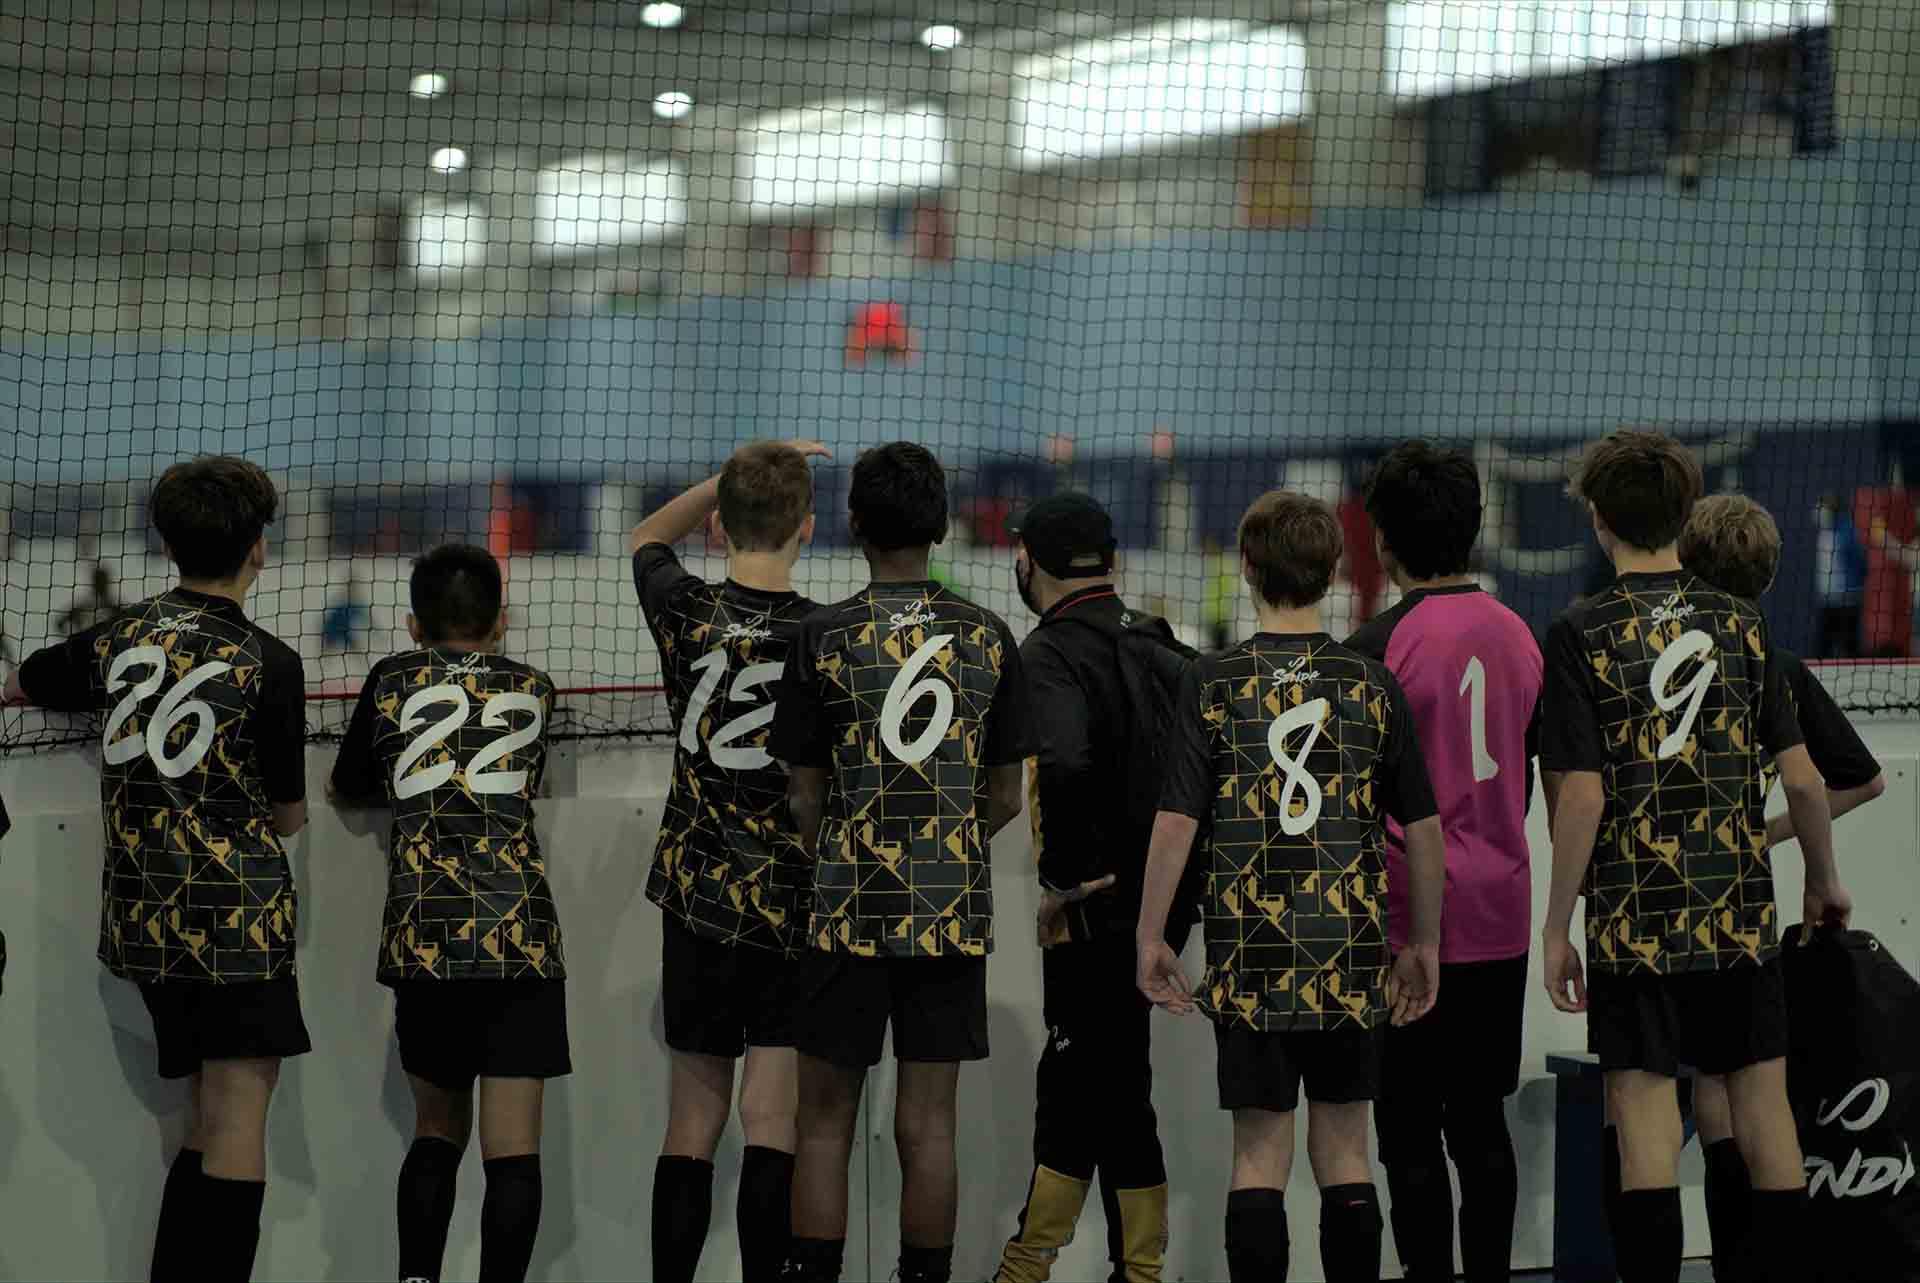 Sudamerica Futsal boys team with Senda customized home uniform